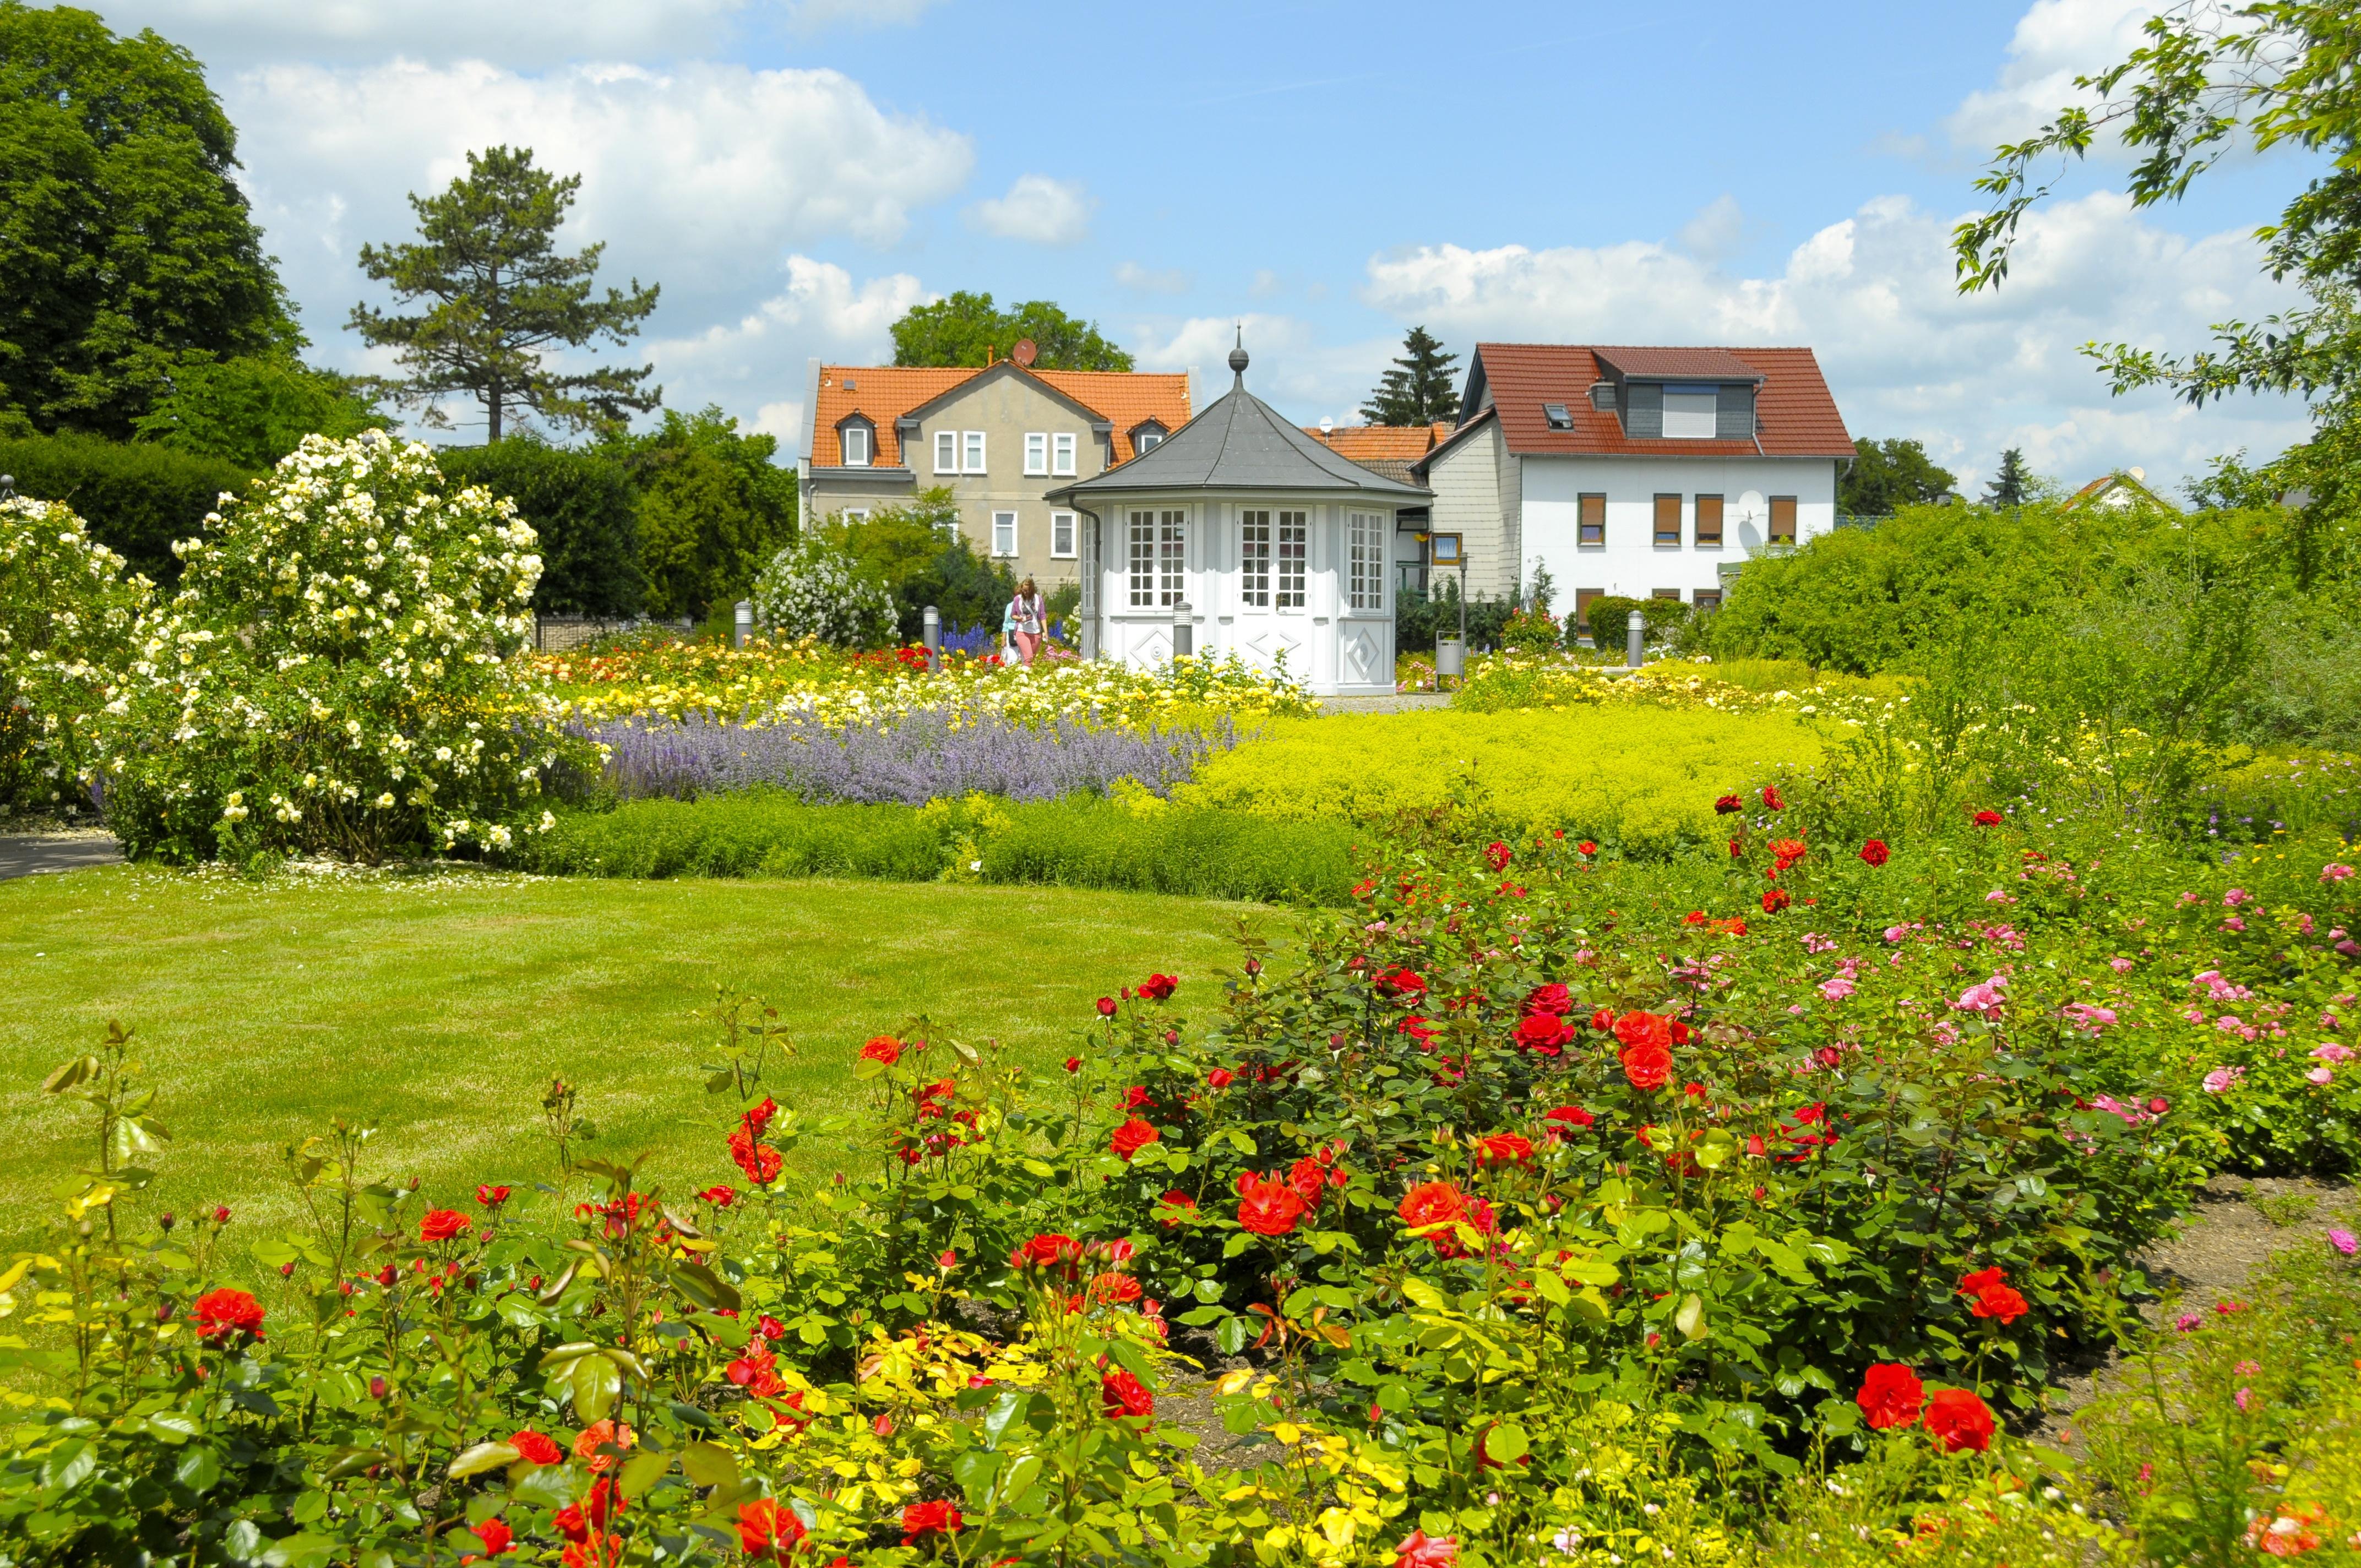 Rosengarten in Bad Langensalza. a.